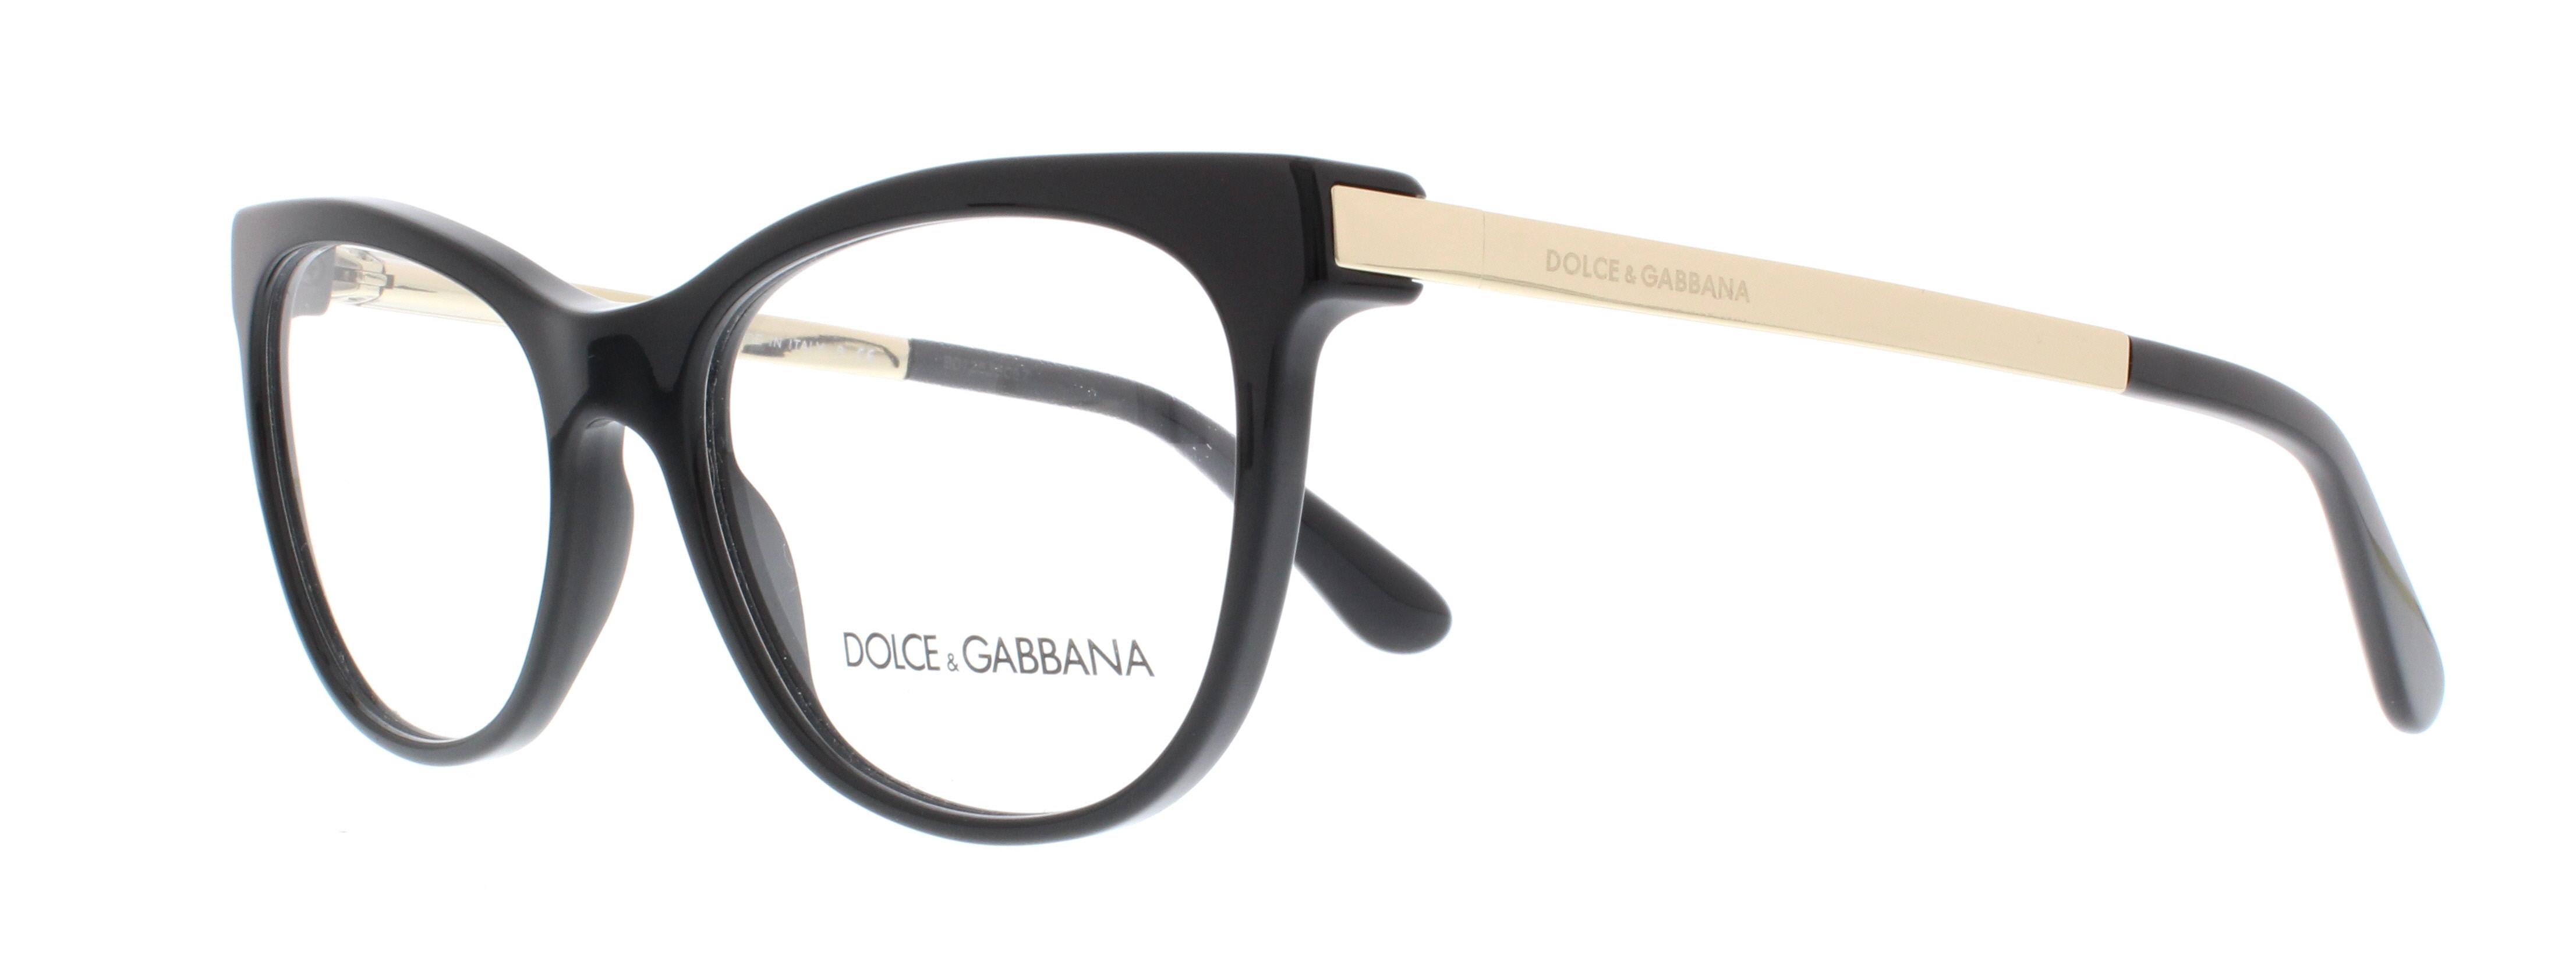 501 black - Dolce And Gabbana Frames